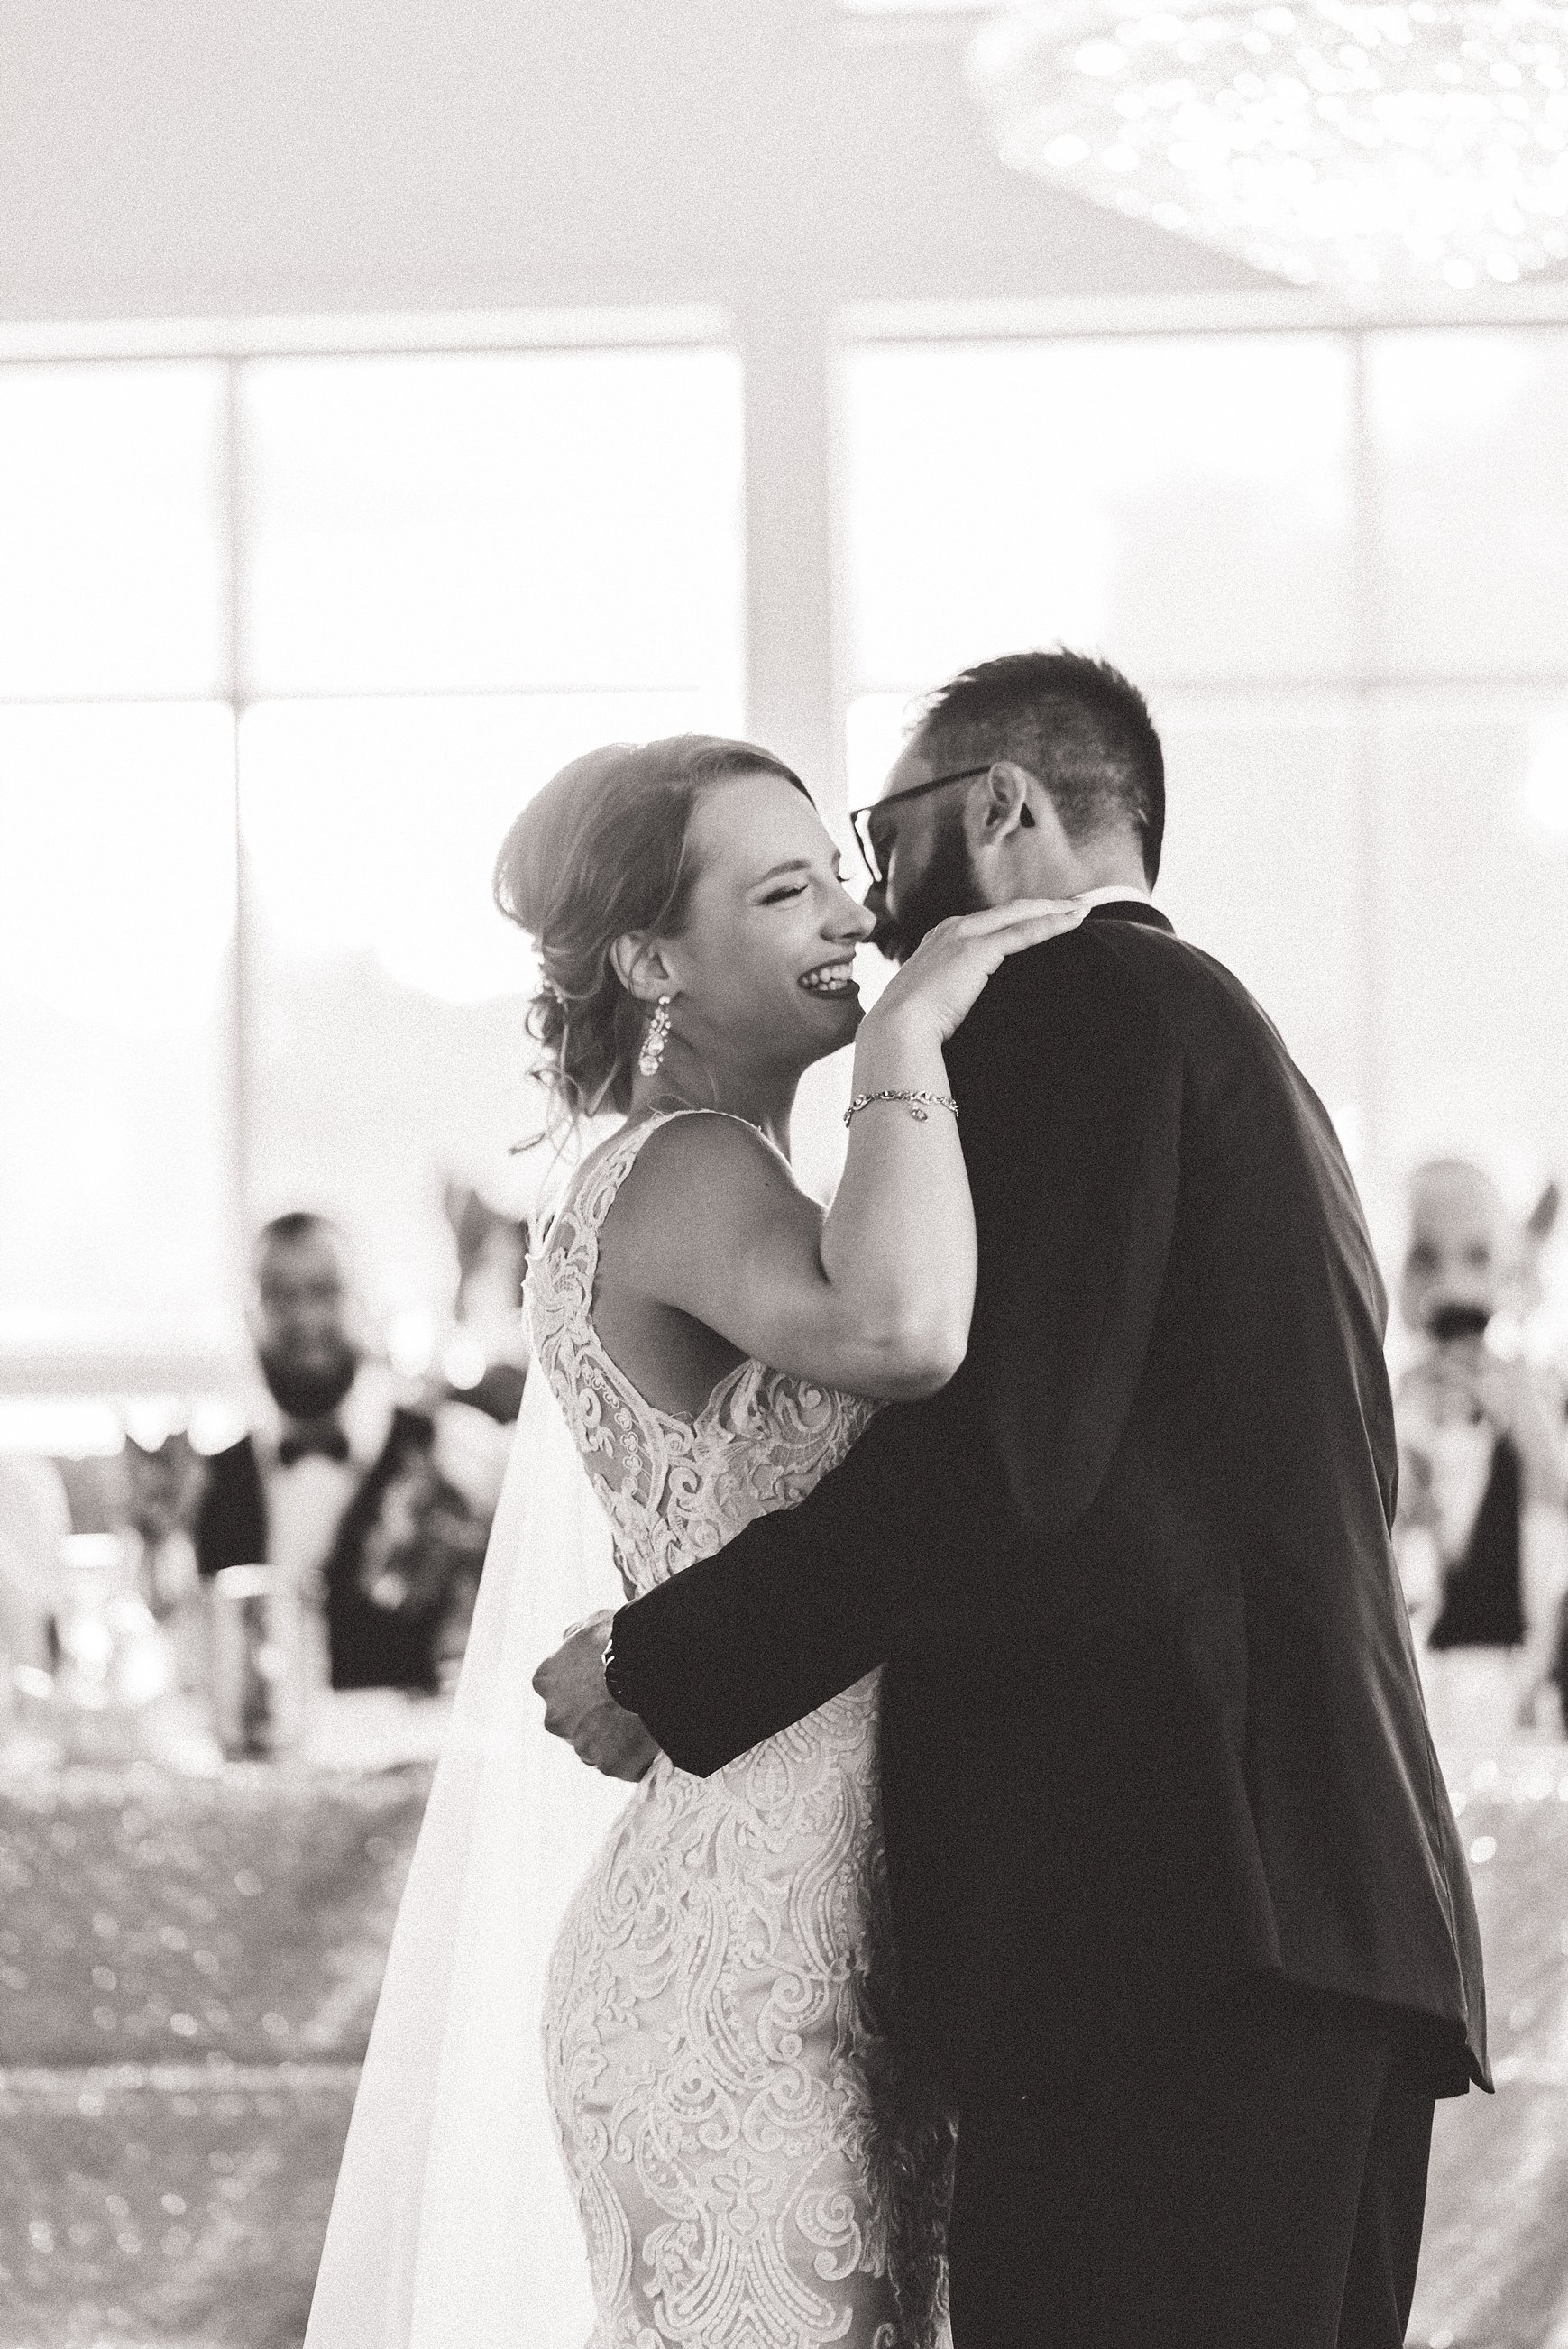 light airy indie fine art ottawa wedding photographer | Ali and Batoul Photography_1333.jpg